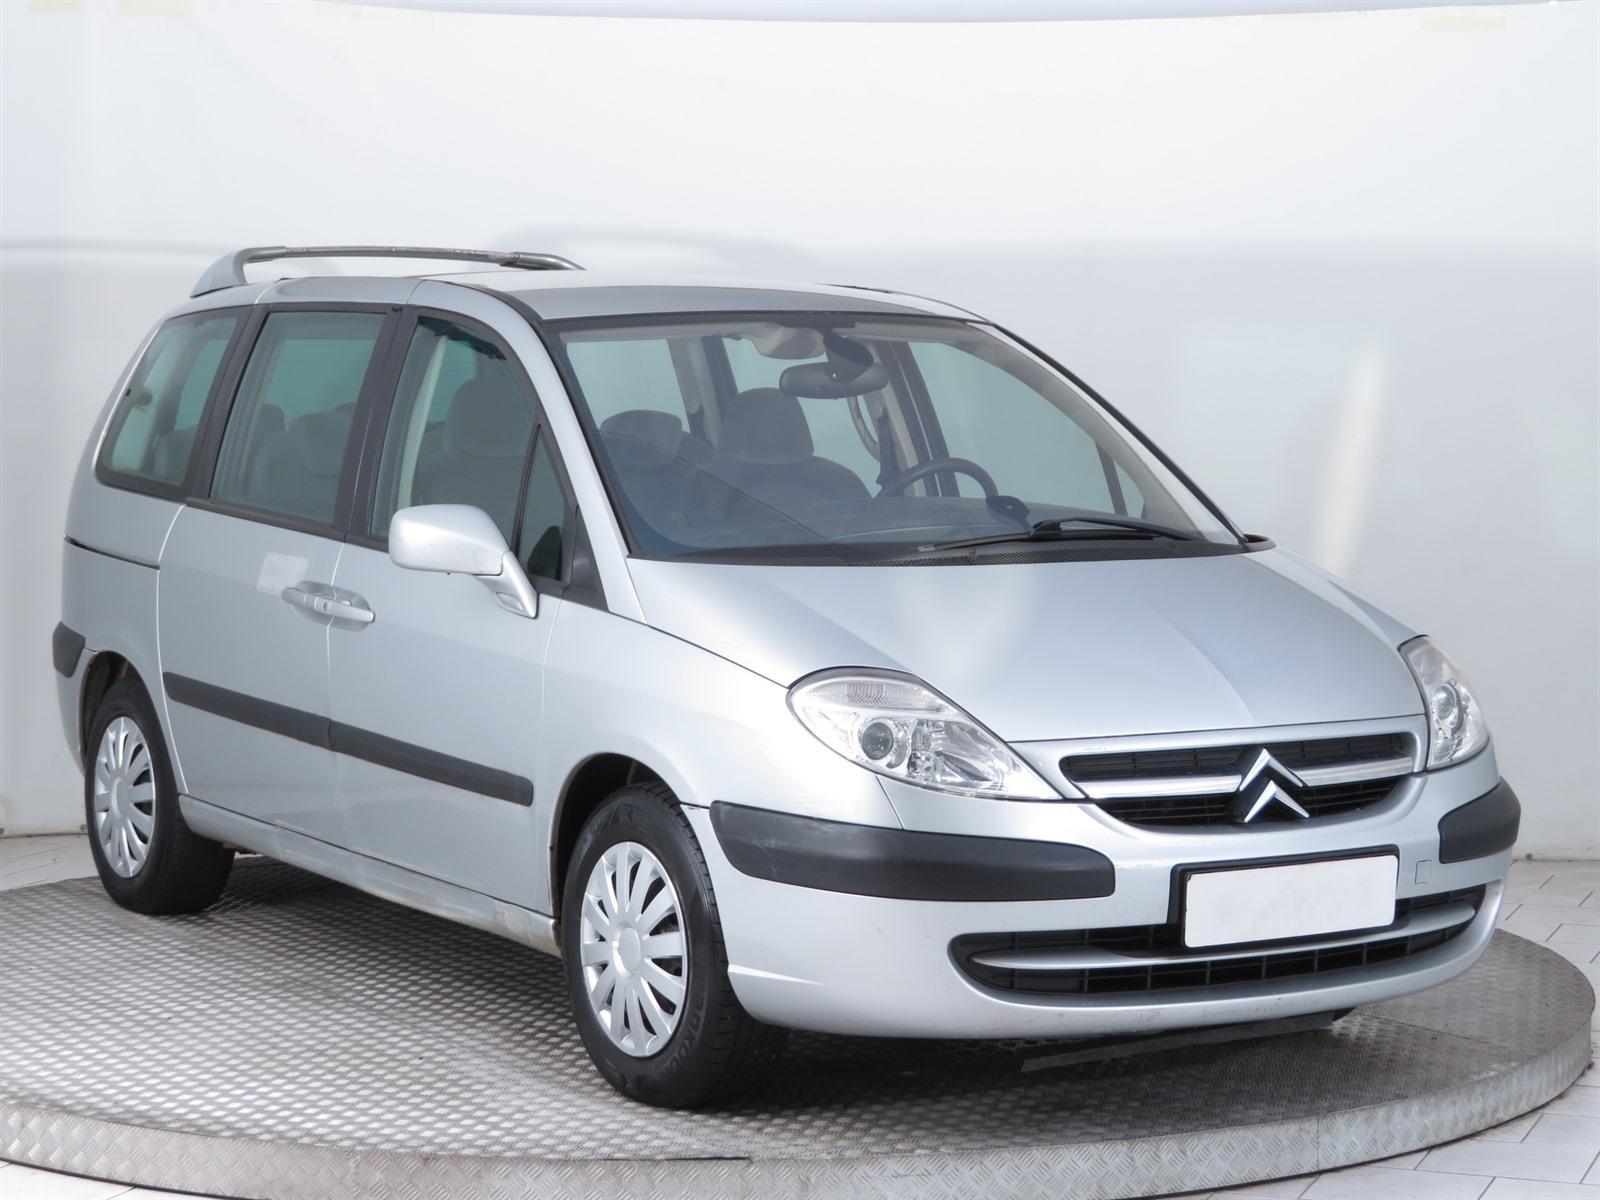 Citroën C8 2.0 16V 103kW MPV benzin